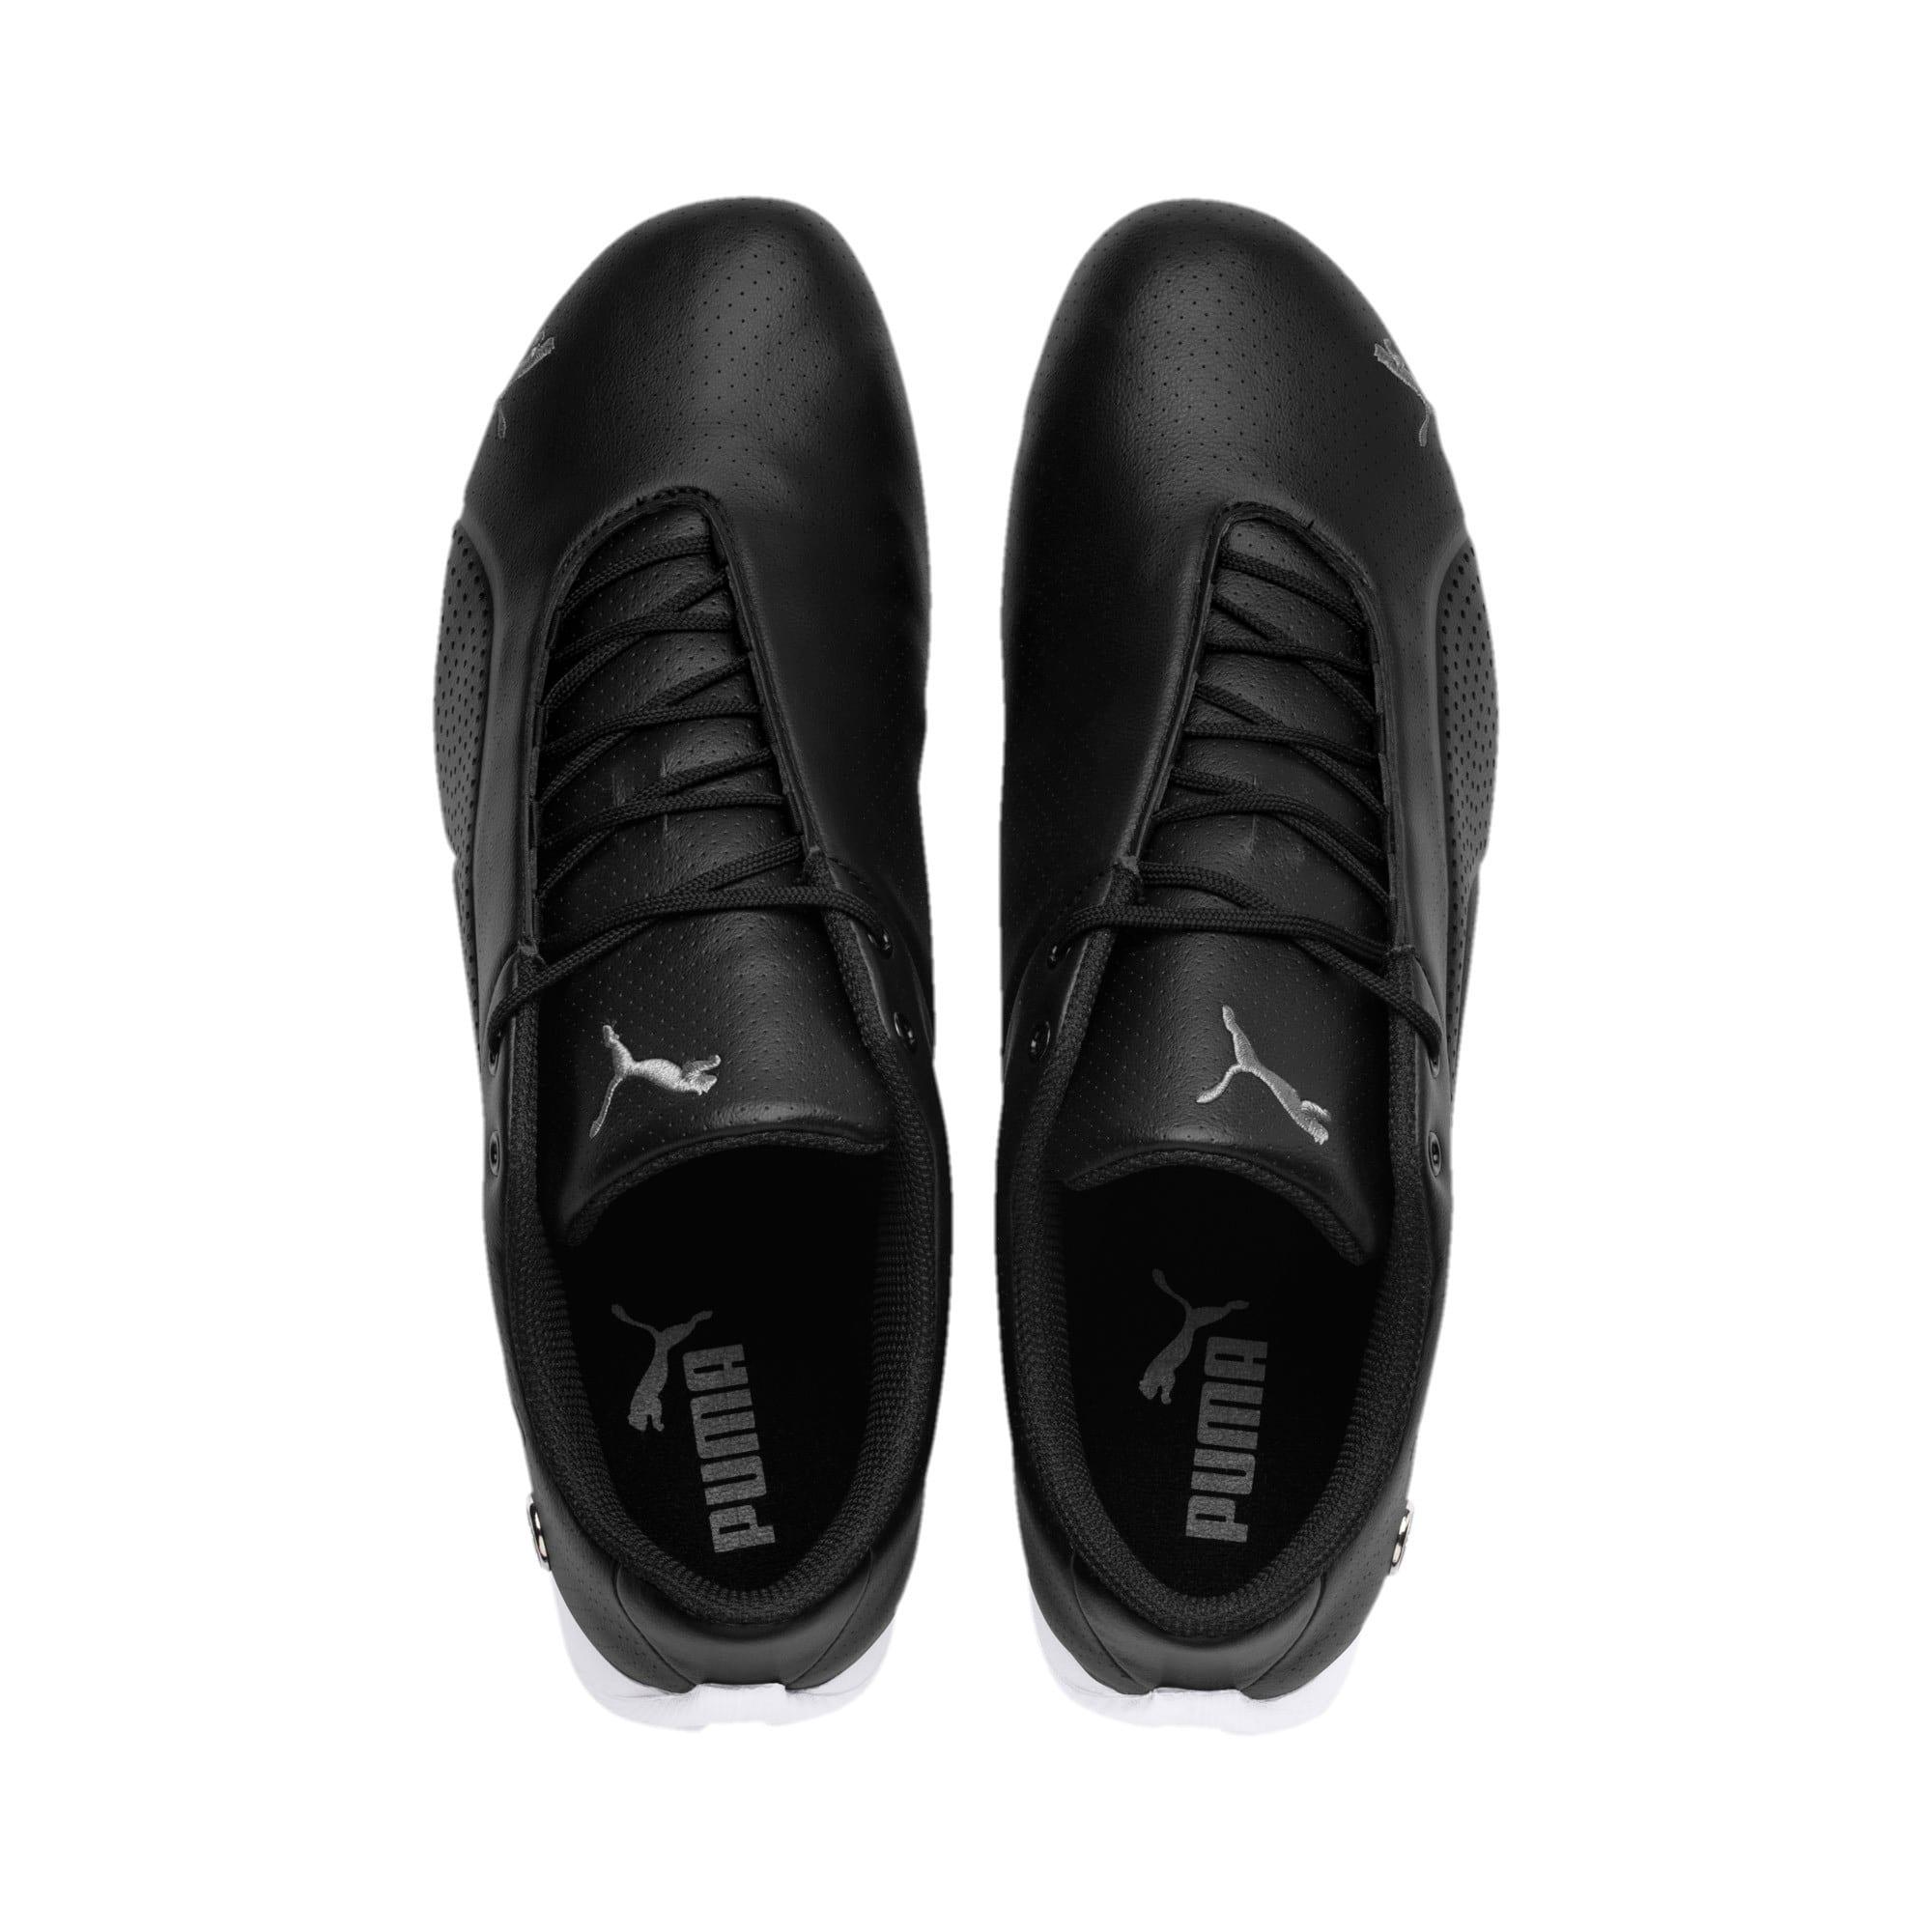 Thumbnail 6 of BMW Motorsport Future Cat Ultra sneakers, Black-White-Gray Violet, medium